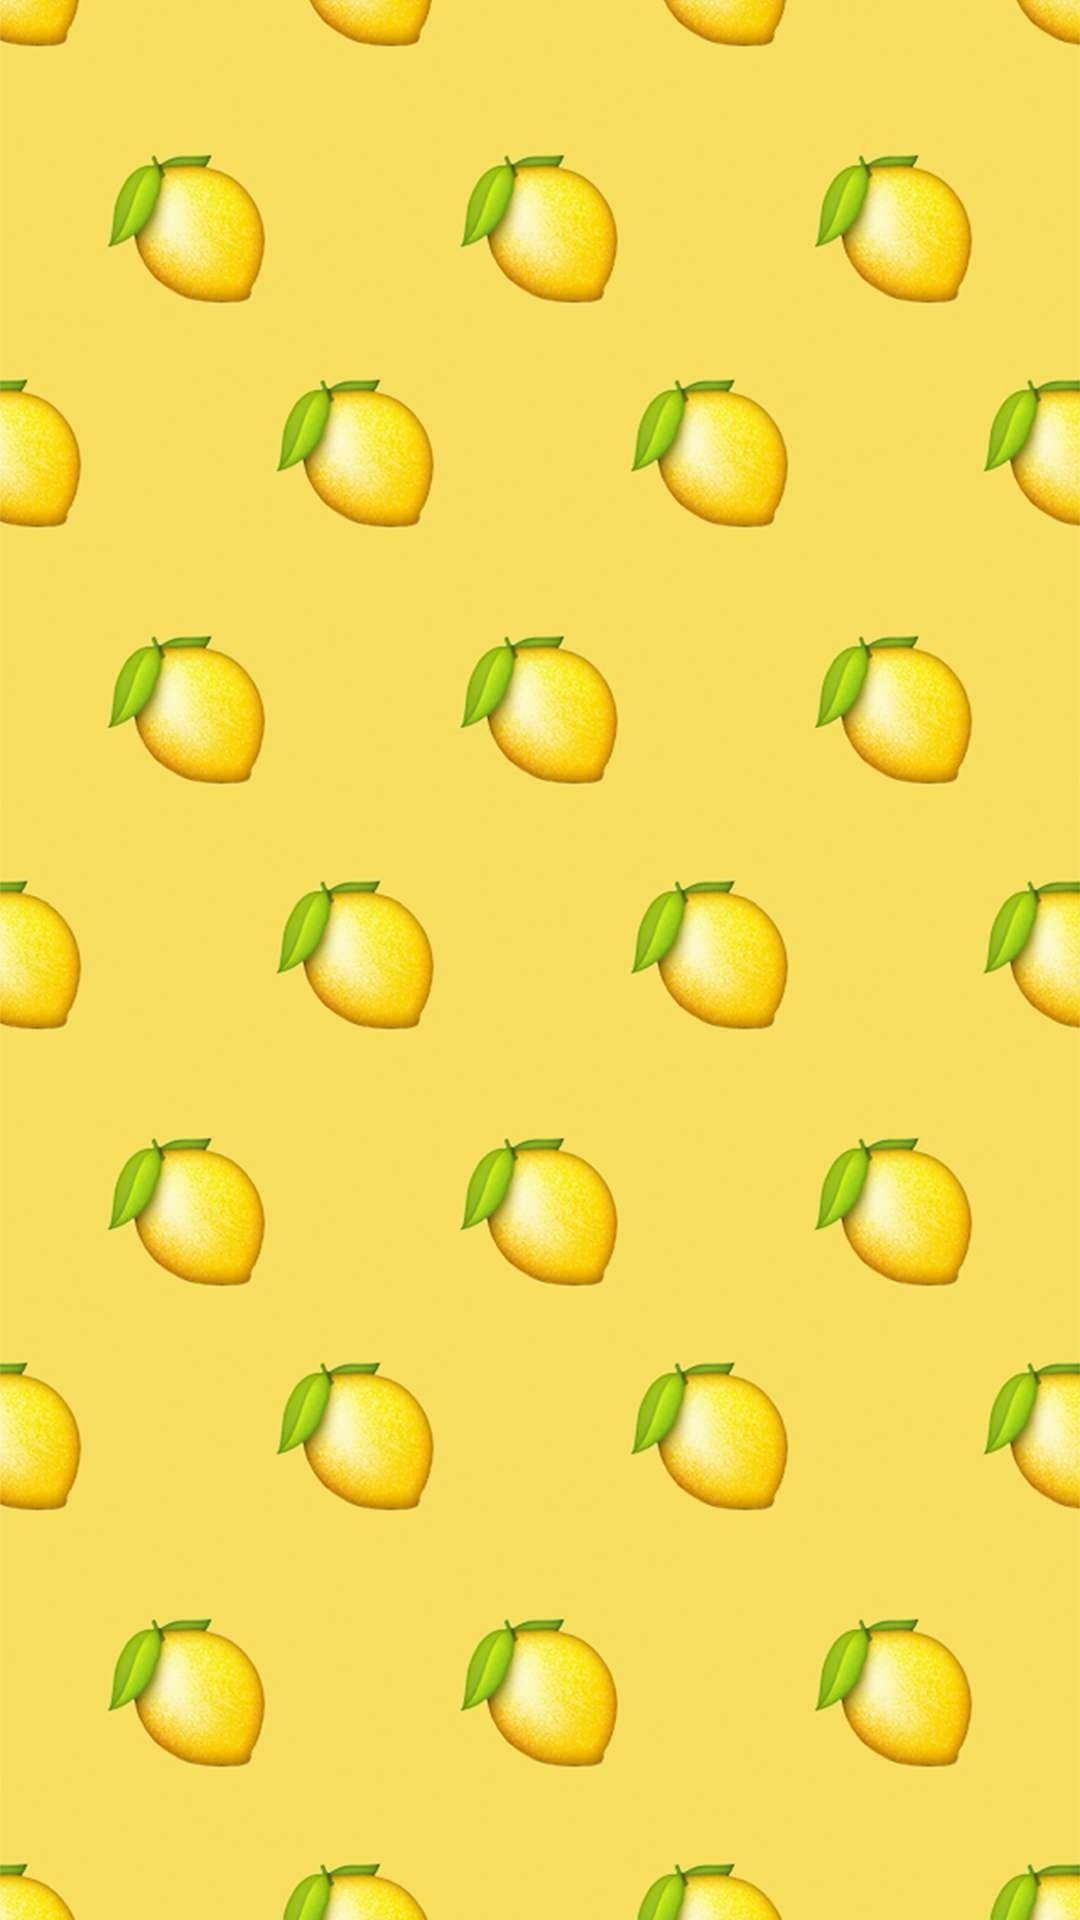 Lemon Aesthetic Wallpapers Top Free Lemon Aesthetic Backgrounds